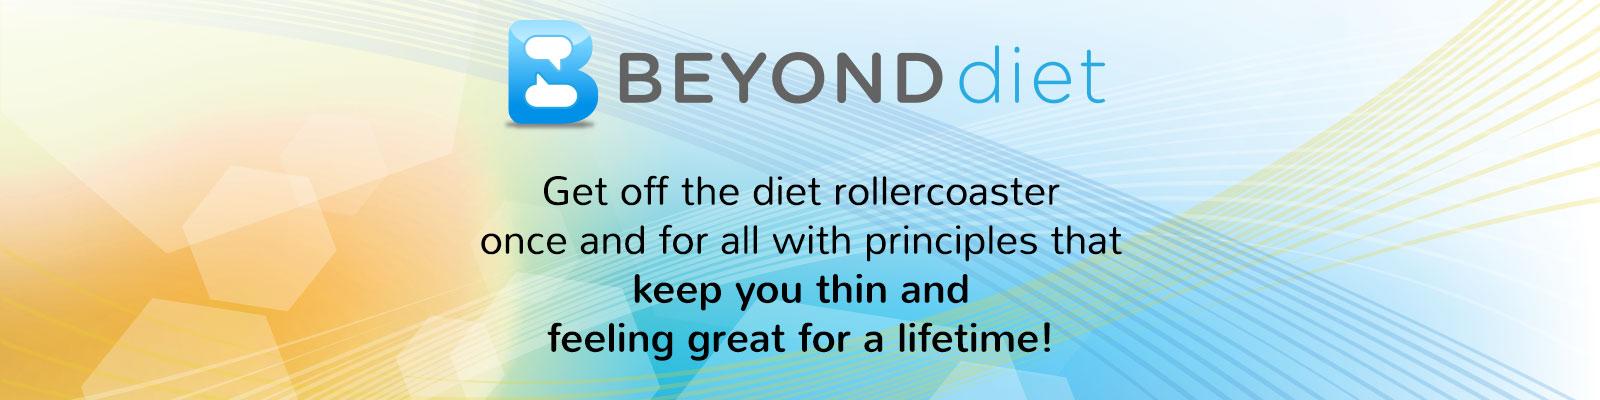 Beyond Diet Program